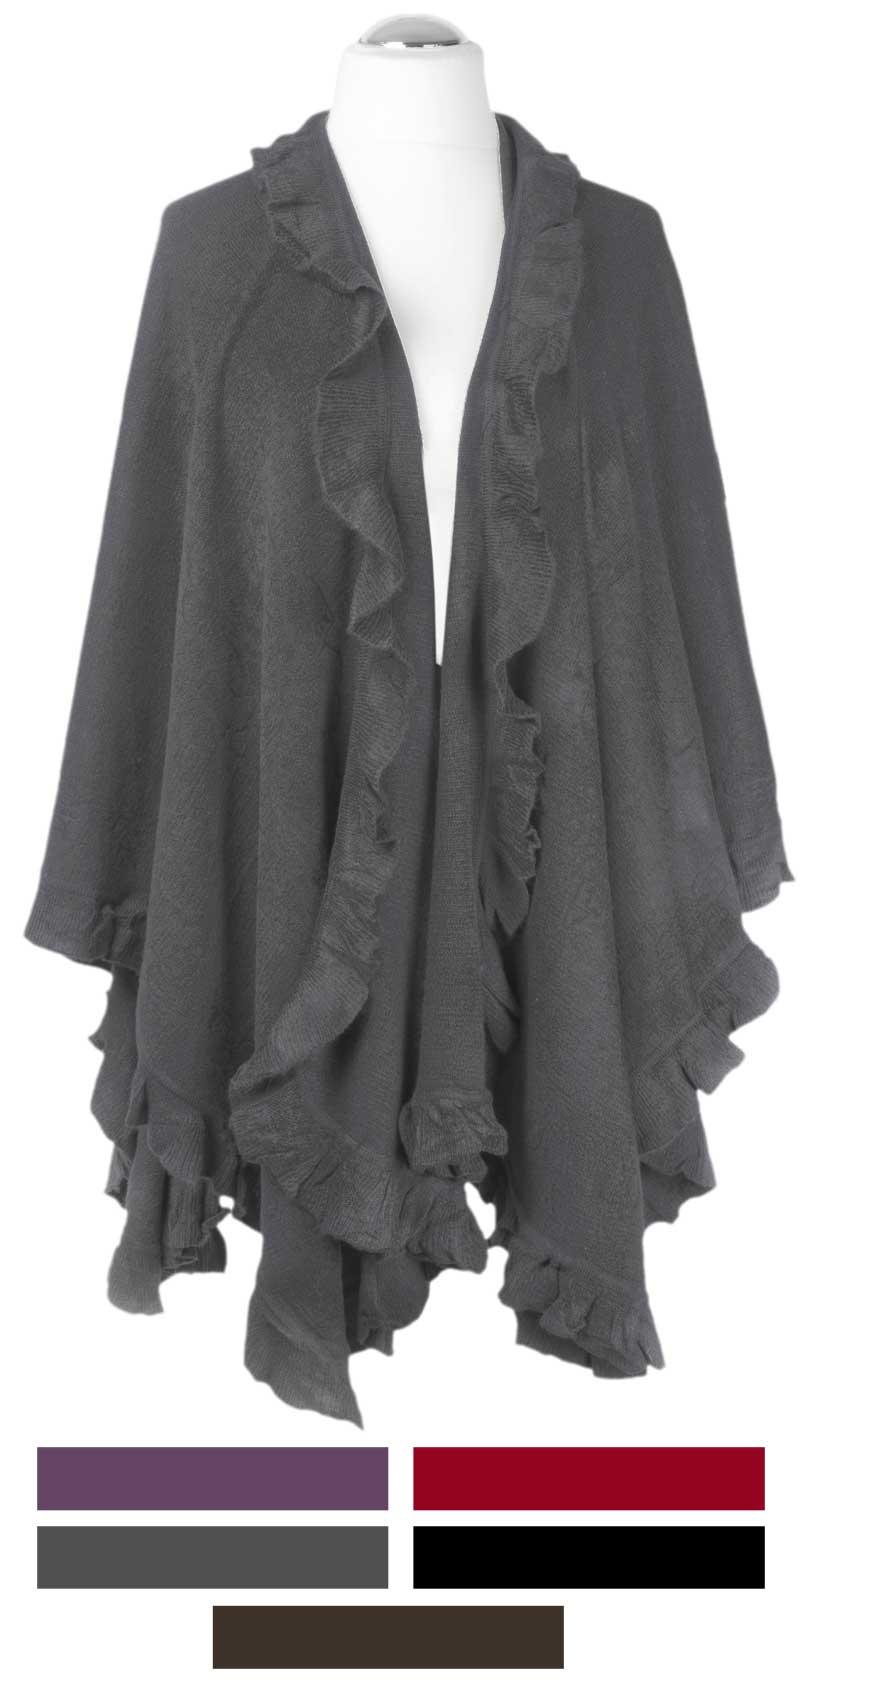 strick poncho cape berwurf schwarz grau braun lila rot ebay. Black Bedroom Furniture Sets. Home Design Ideas